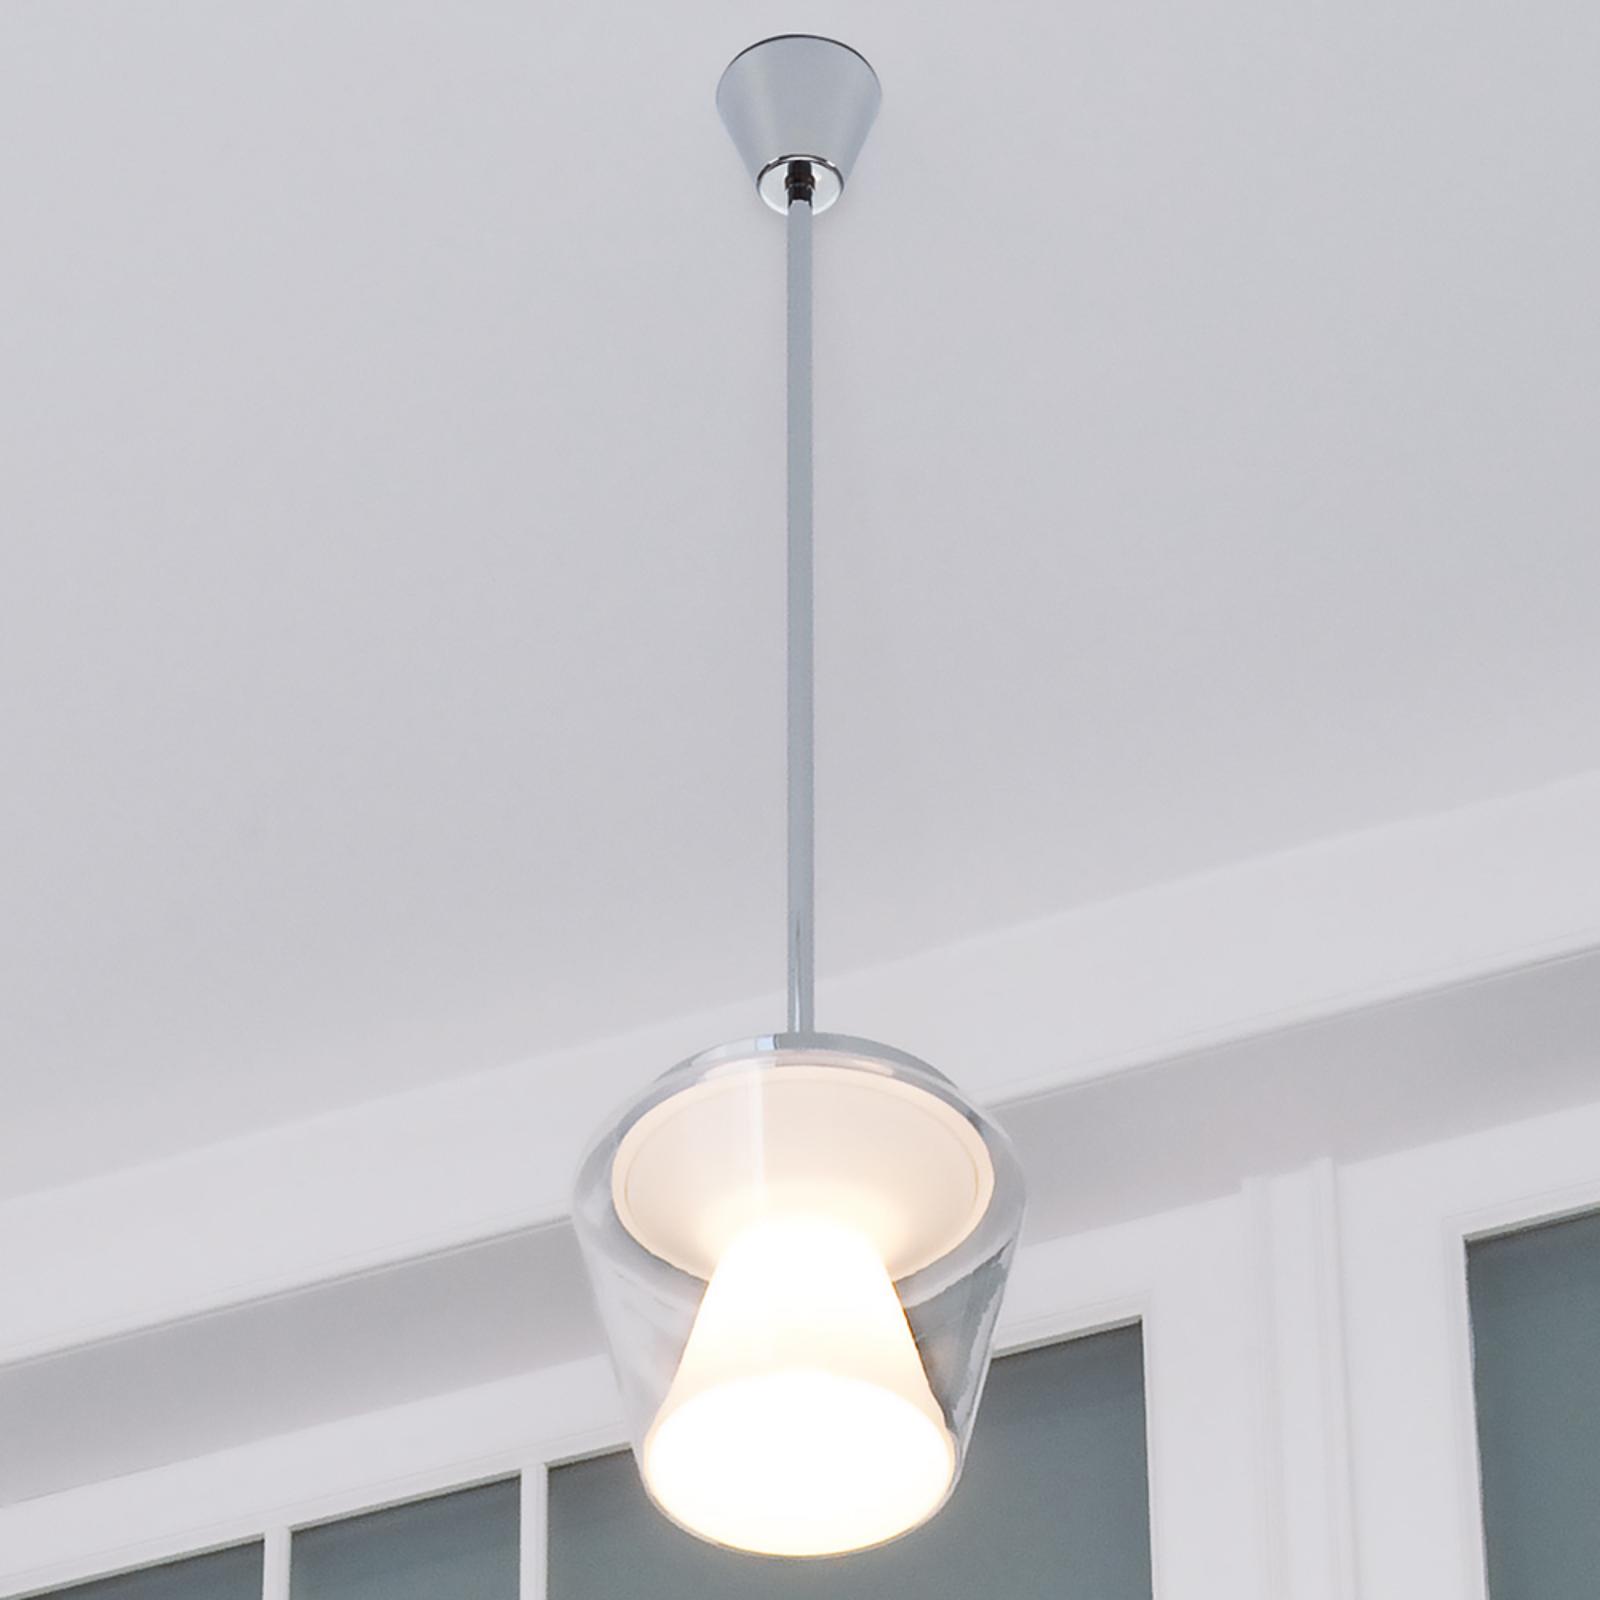 LED-design-riippuvalaisin Annex lasivarjostimella